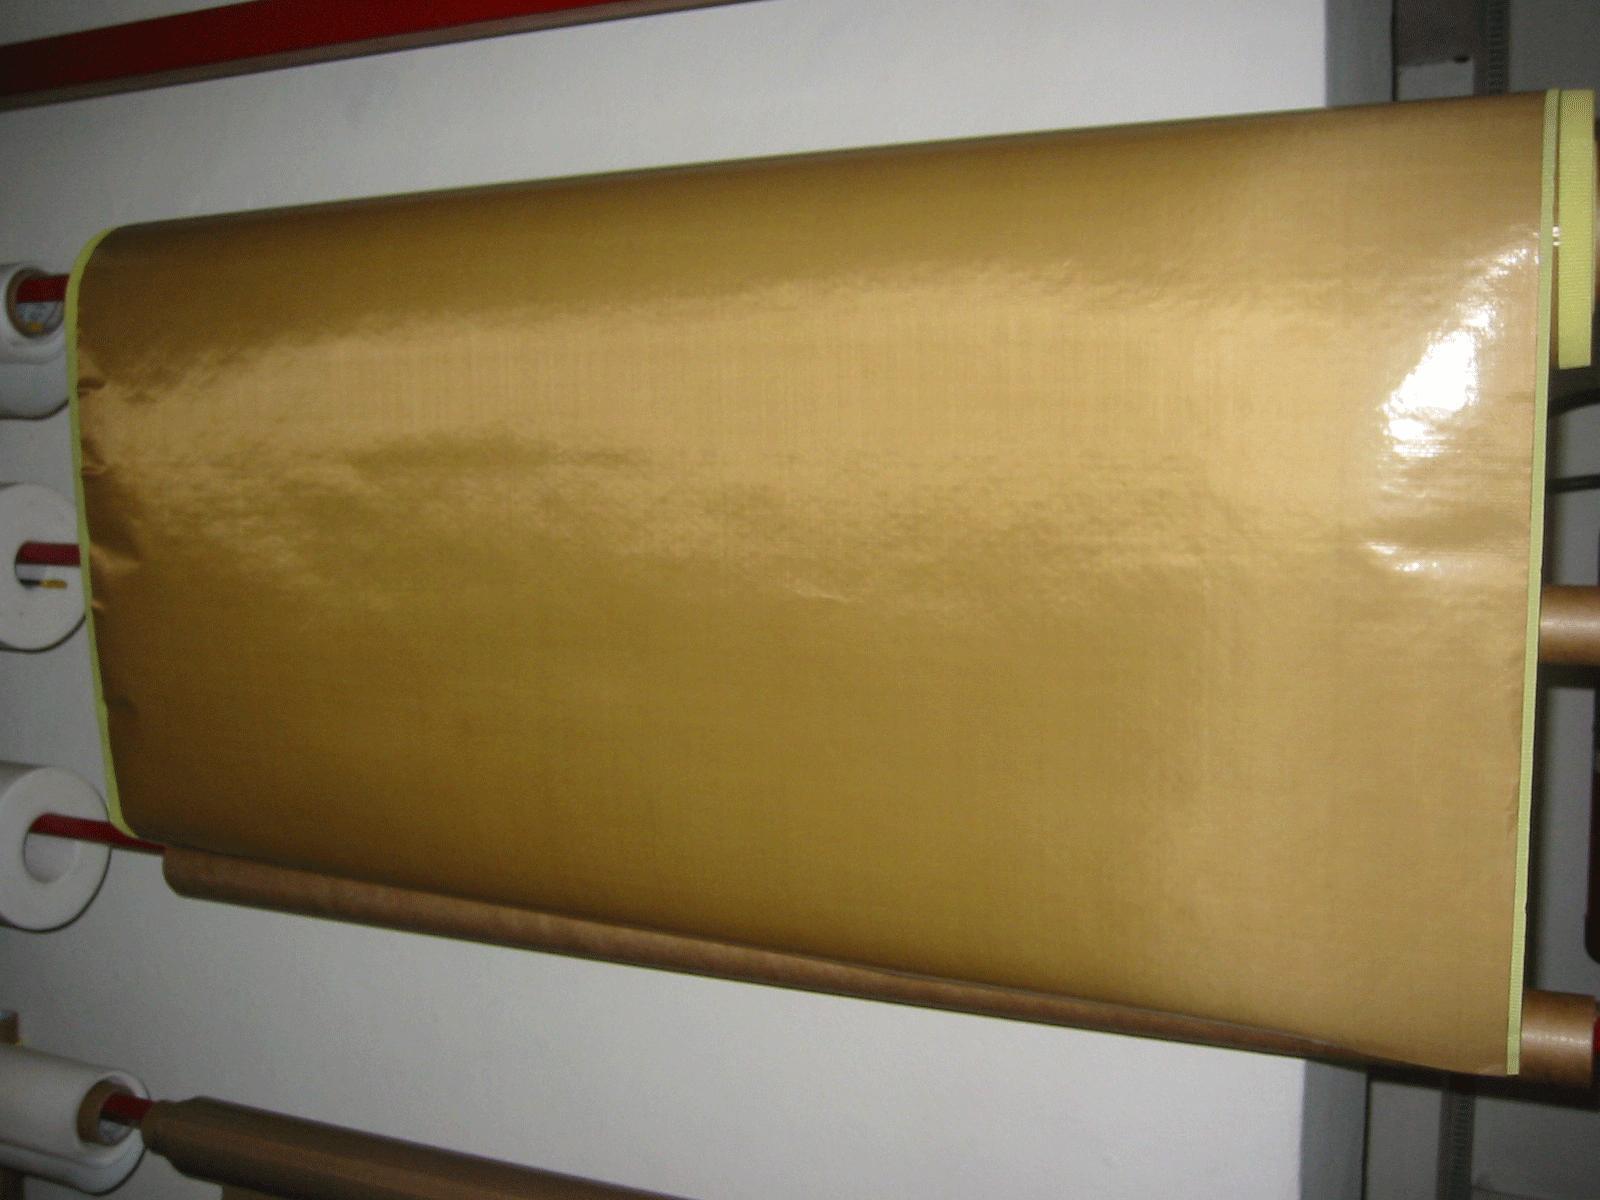 PTFE Coated Glass Fiber Adhesive Tape